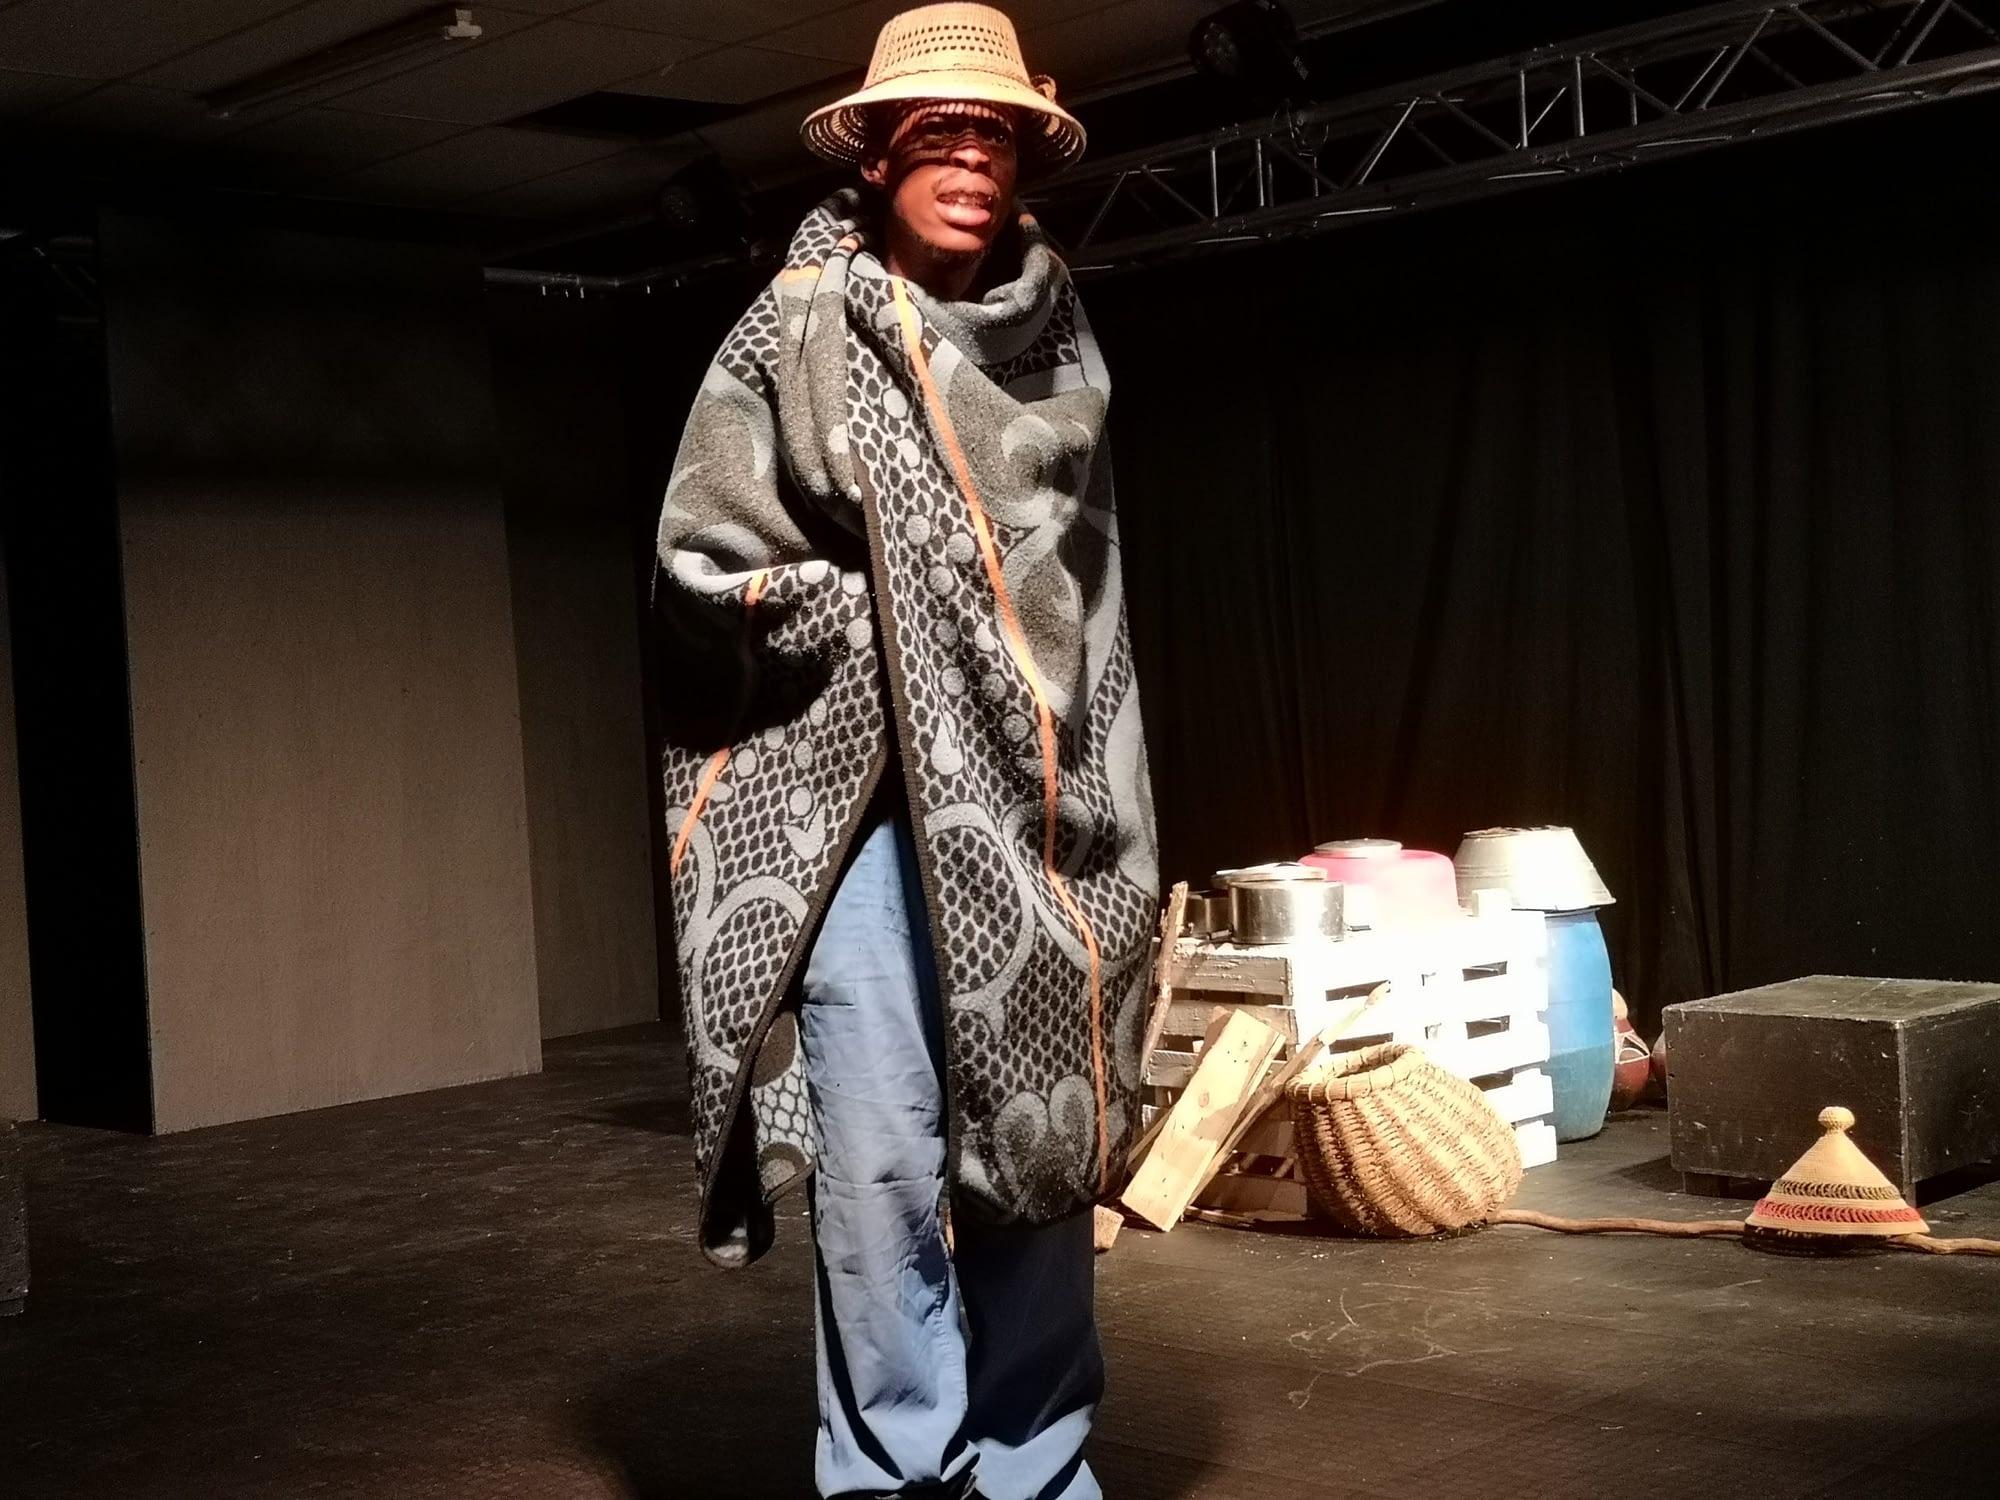 Lerumo featured Malaika Motshabi Ntsoeu, Malefu Mariti and Tankiso Sebabole as part of the Kuwamba Women's Theatre Festival at the TX Theatre in Tembisa (Sthembiso Radebe and Thokozani Maseko)